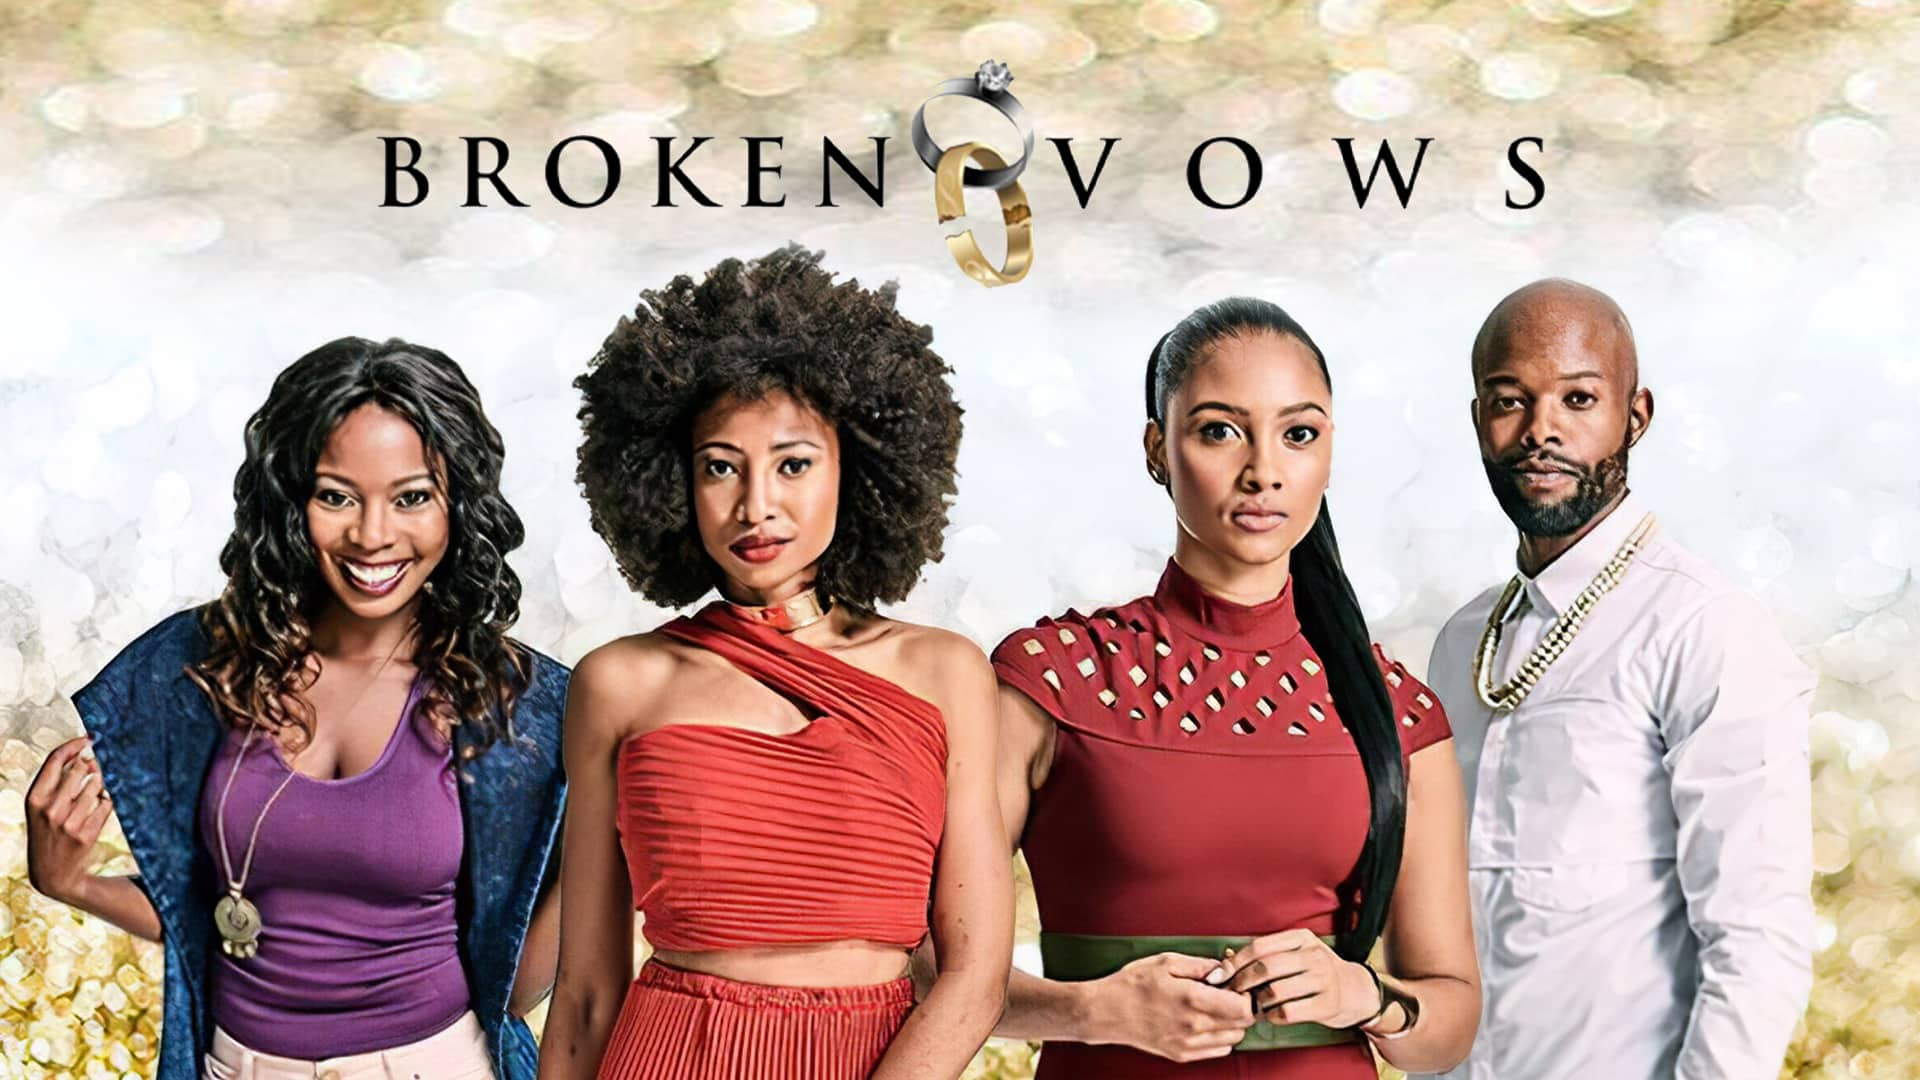 Broken Vows Poster 1920x1080 16x9